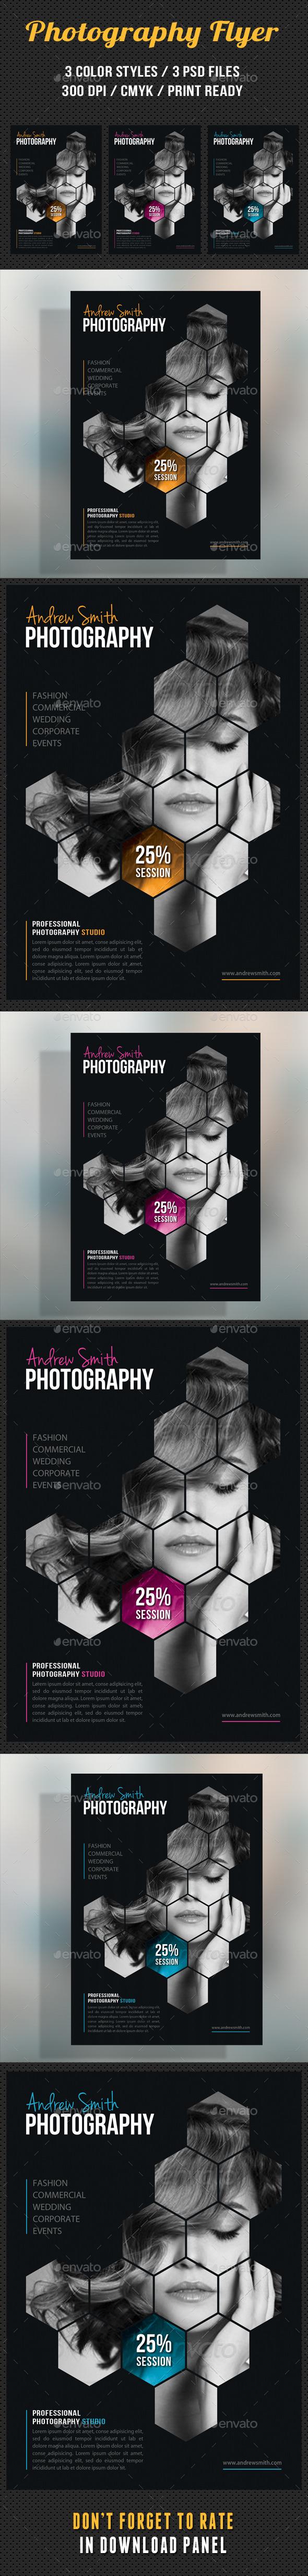 GraphicRiver Photography Studio Flyer 10 8899203